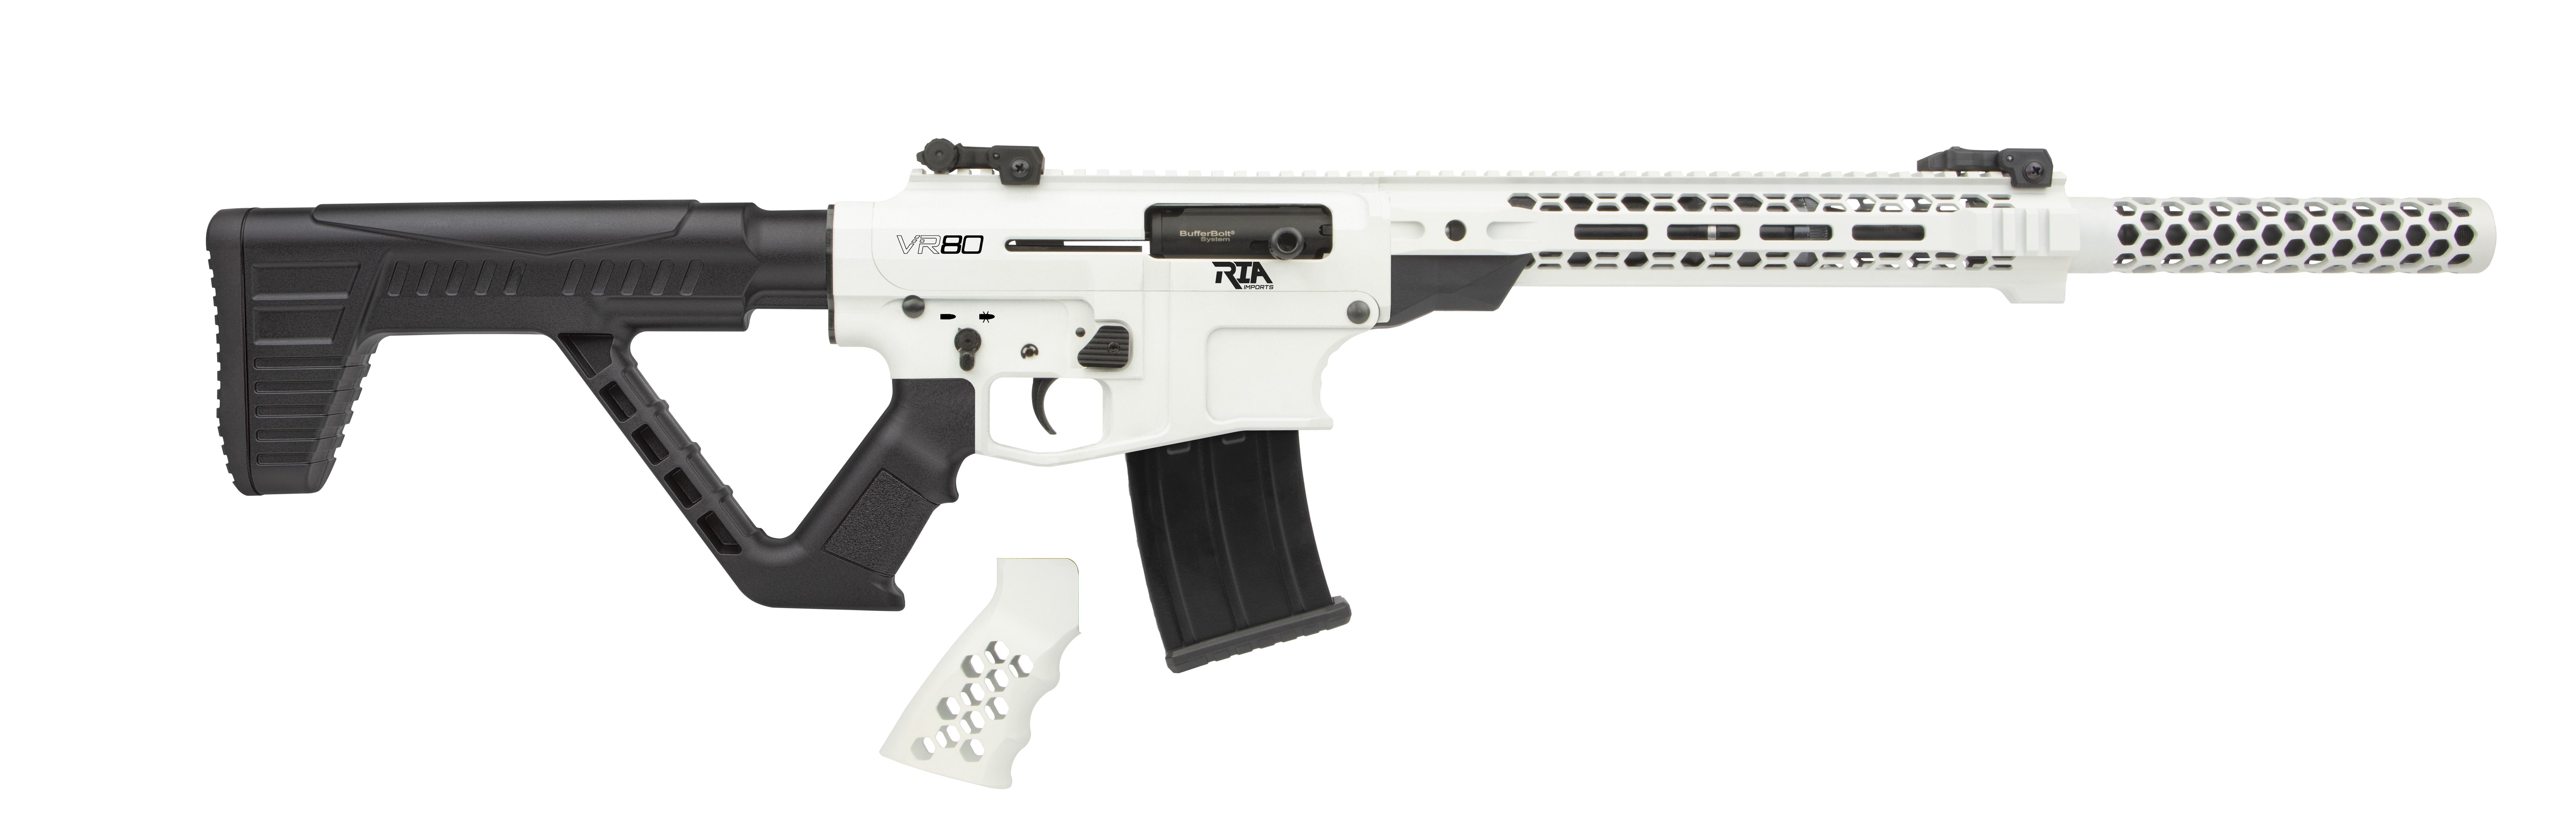 Rock Island Armory VR80 SHOTGUN 12 GAUGE